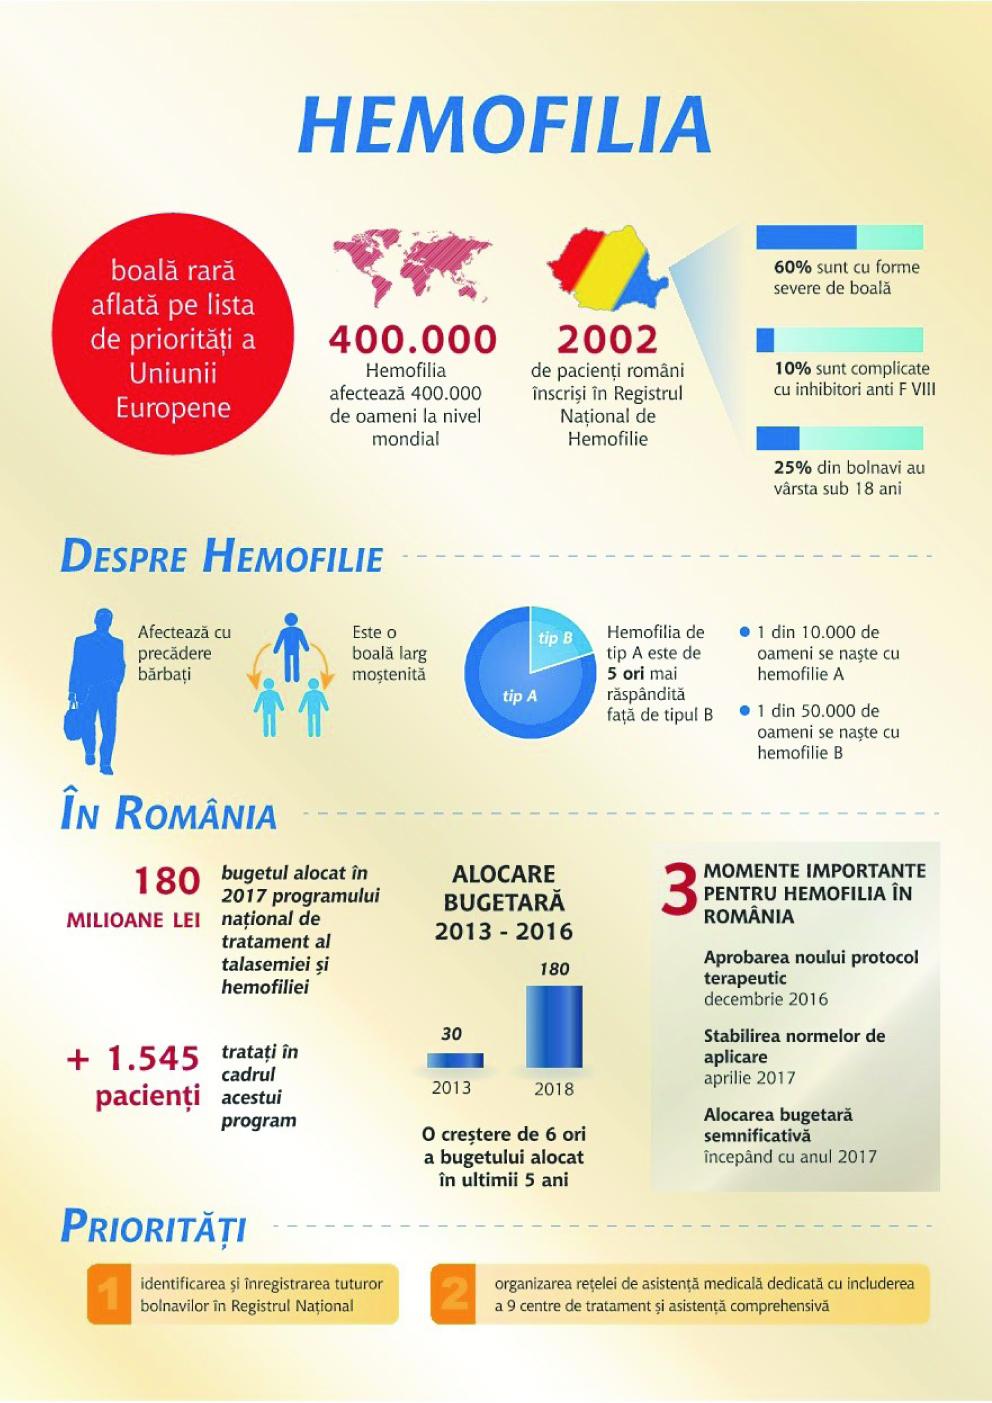 Hemofilia în România – Date relevante